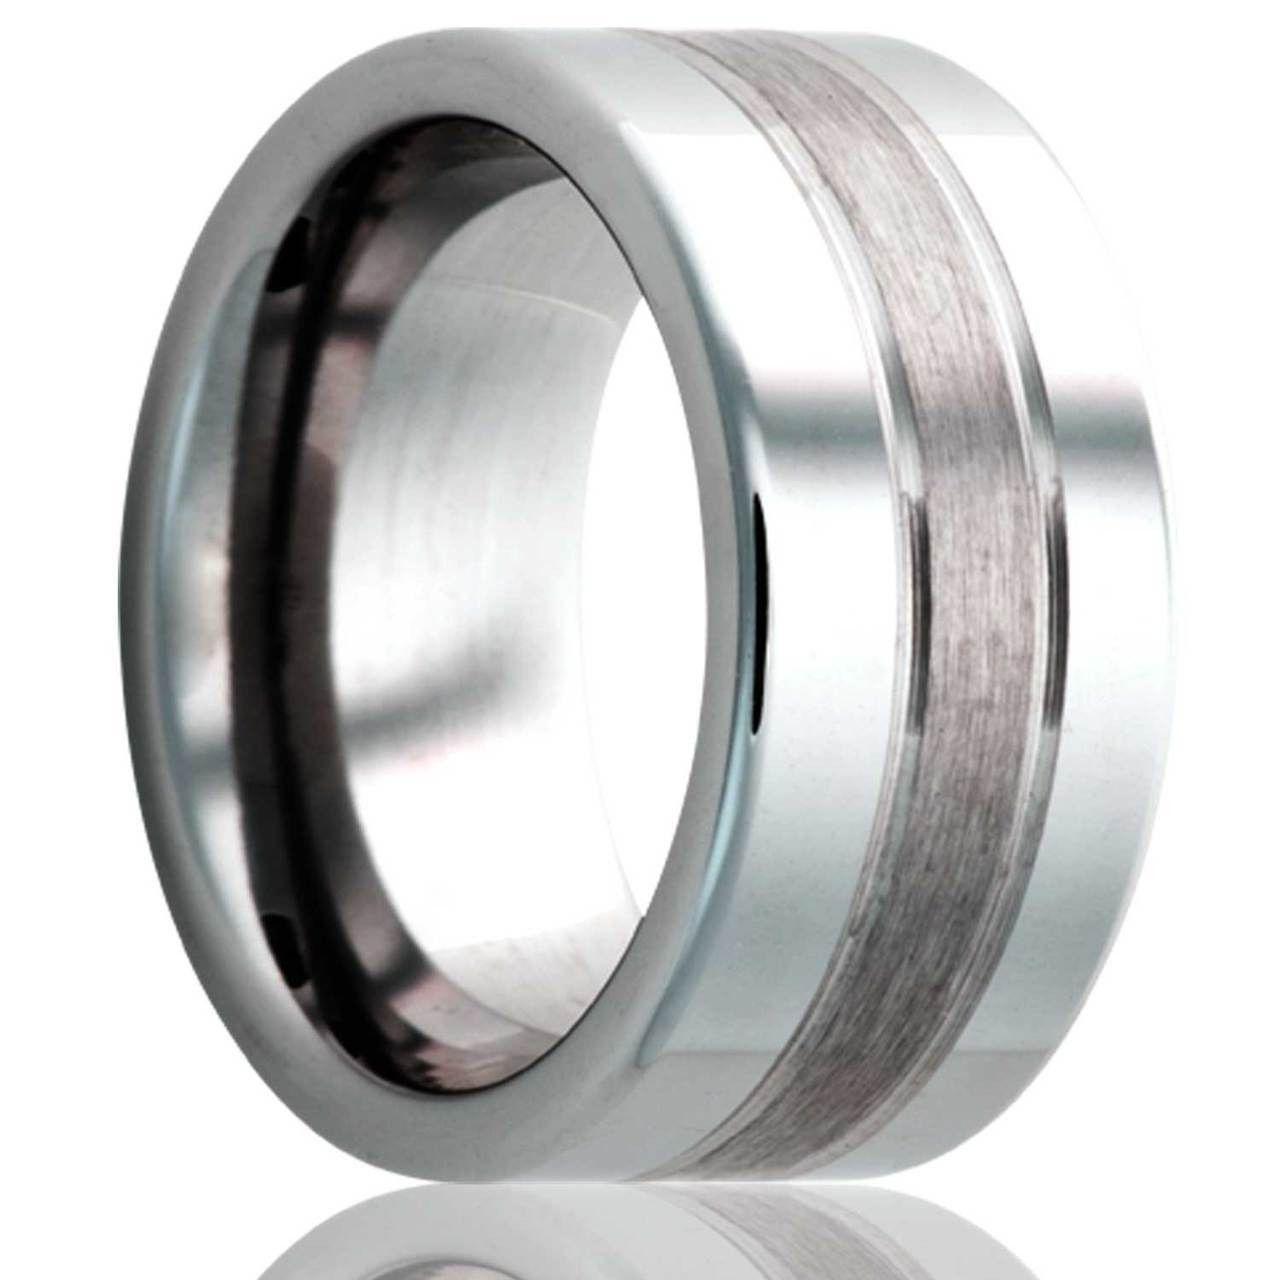 Tungsten Carbide Men Wedding Band Ring Grooved Center Beveled Satin Finish 6mm